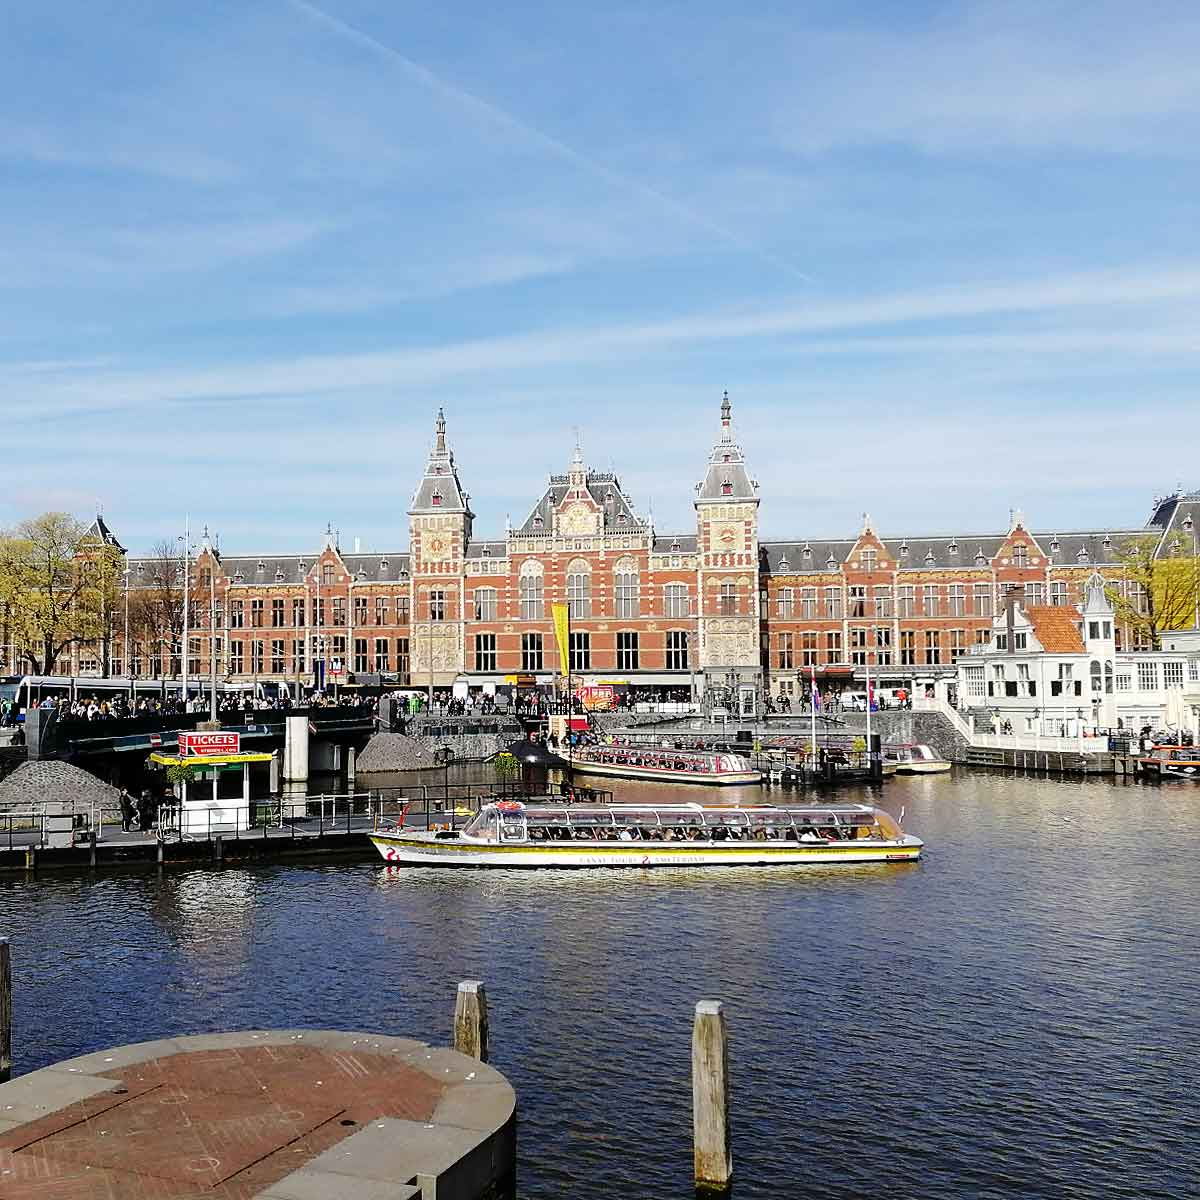 #perhoreissaa – 's-Hertogenbosch, Hollanti